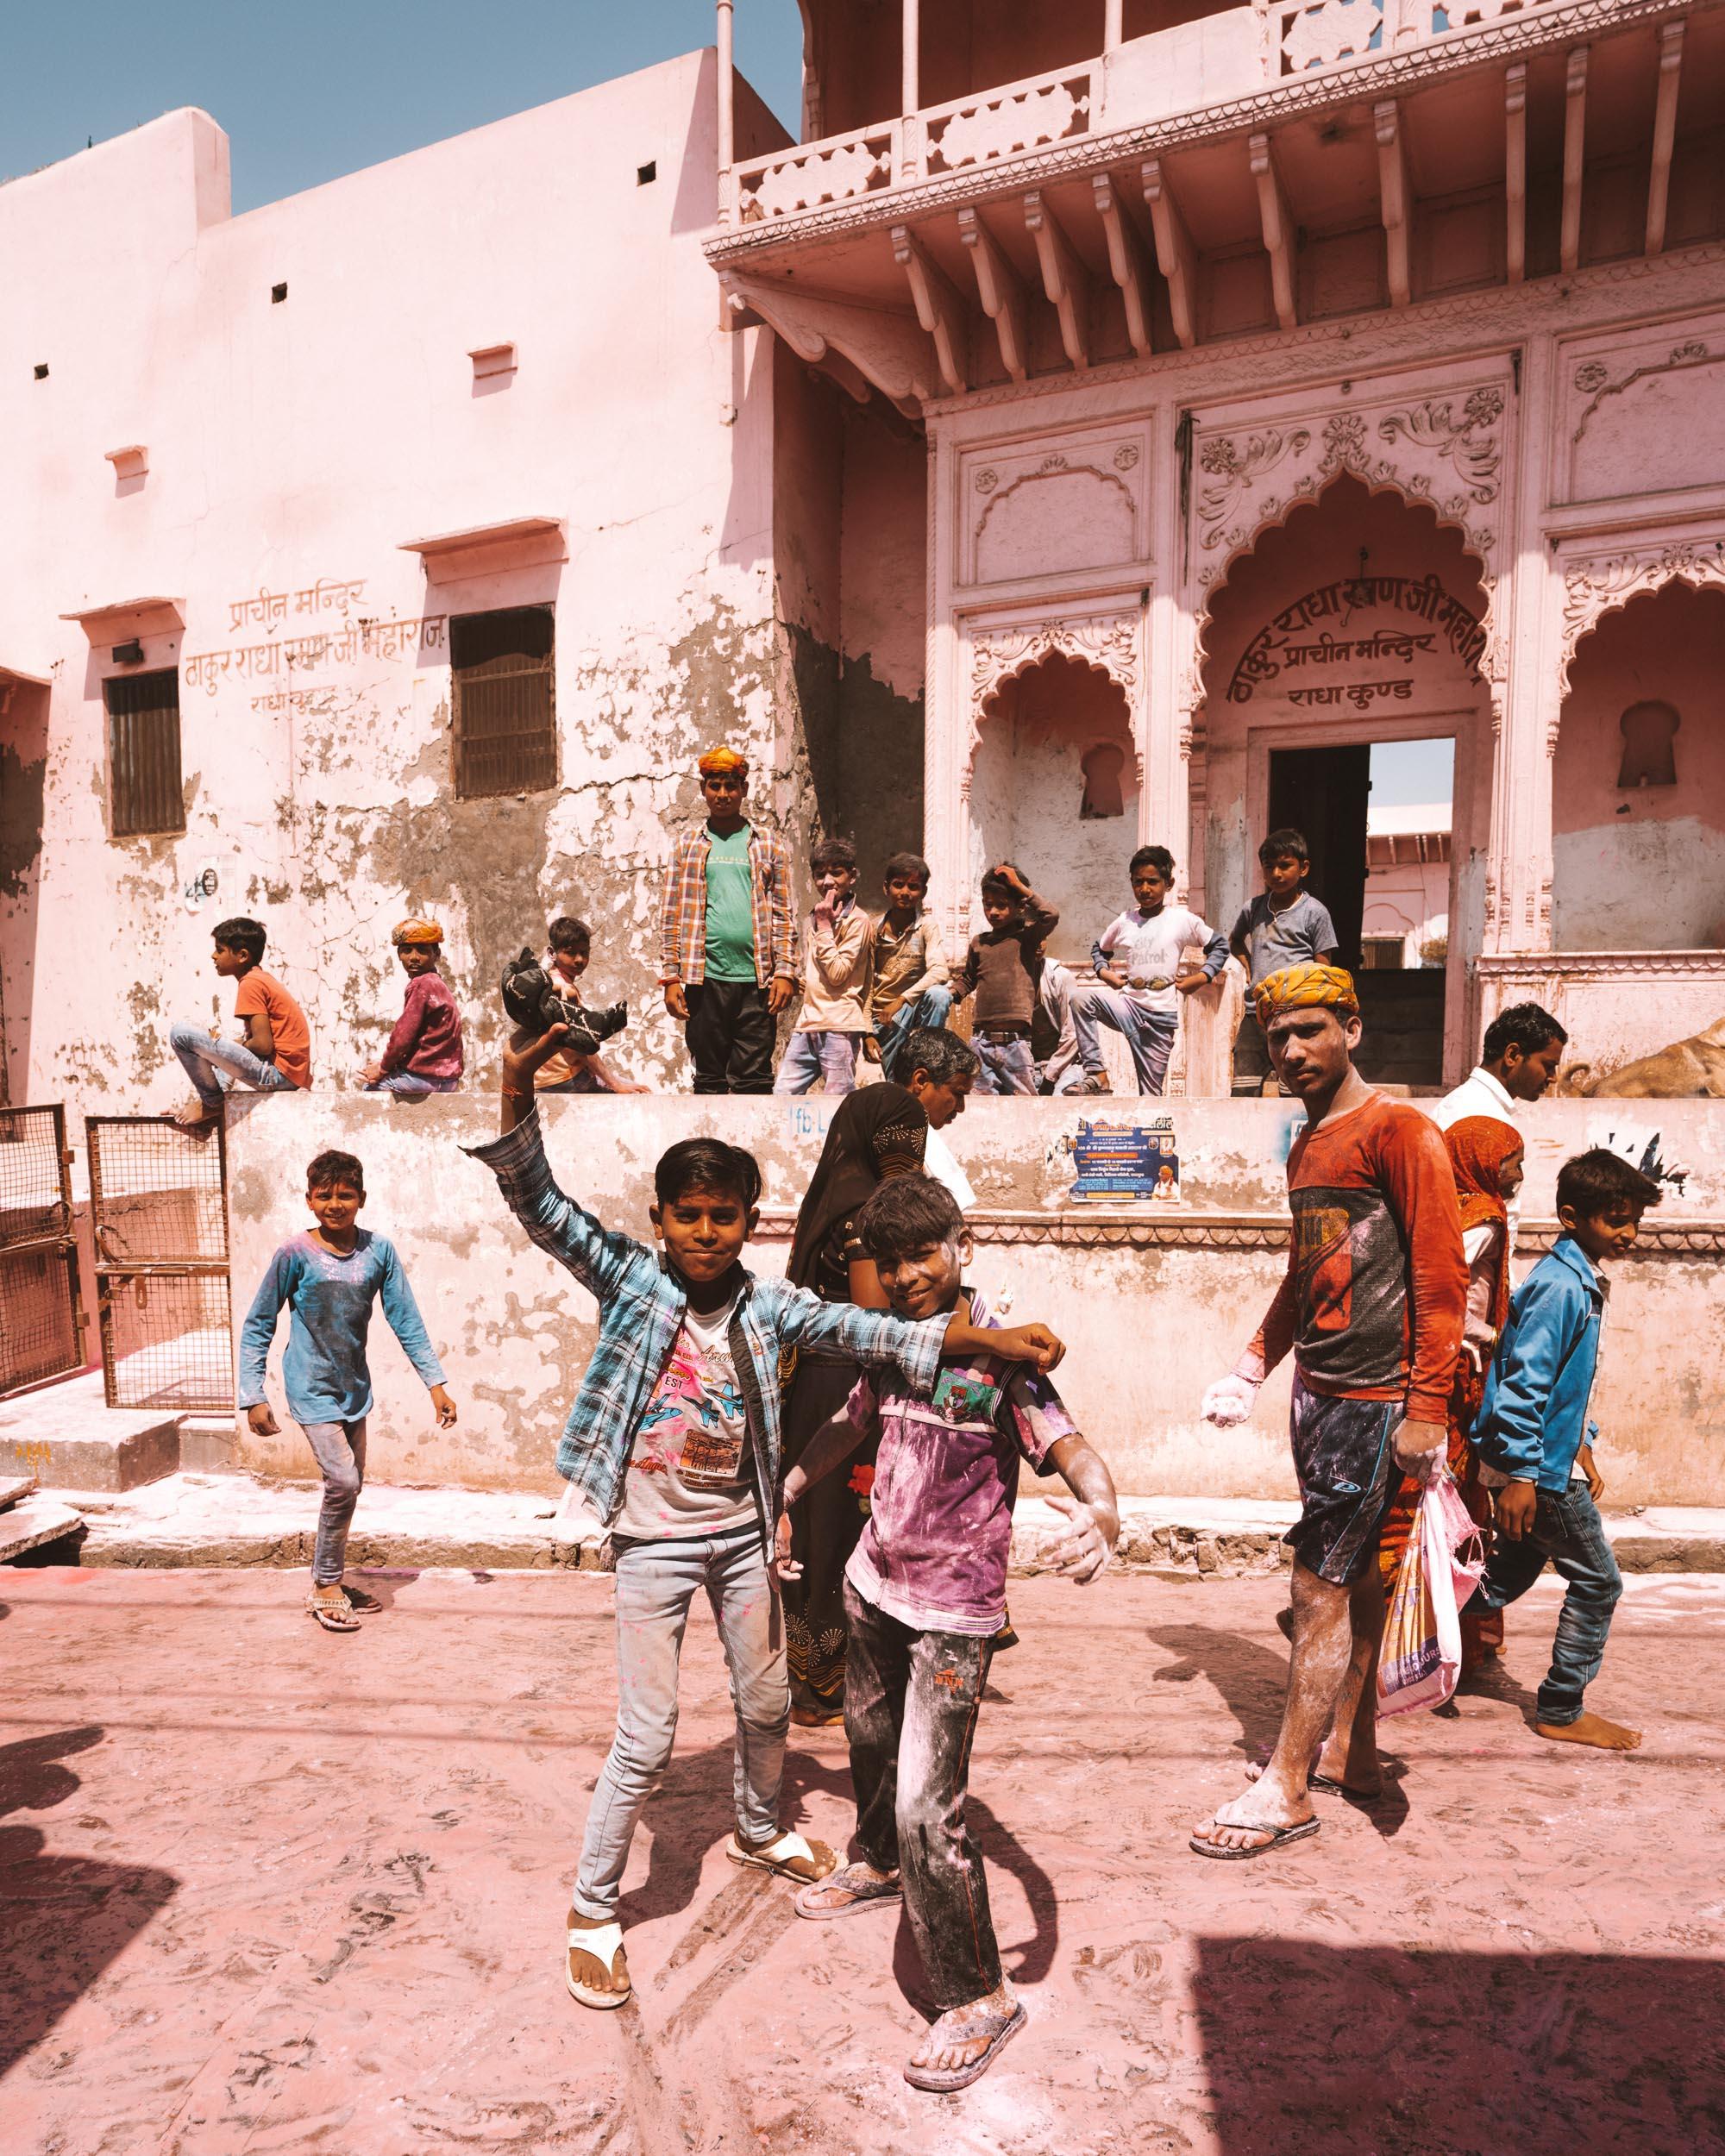 Children celebrating Holi Festival in the streets of Govardhan, India via @finduslost